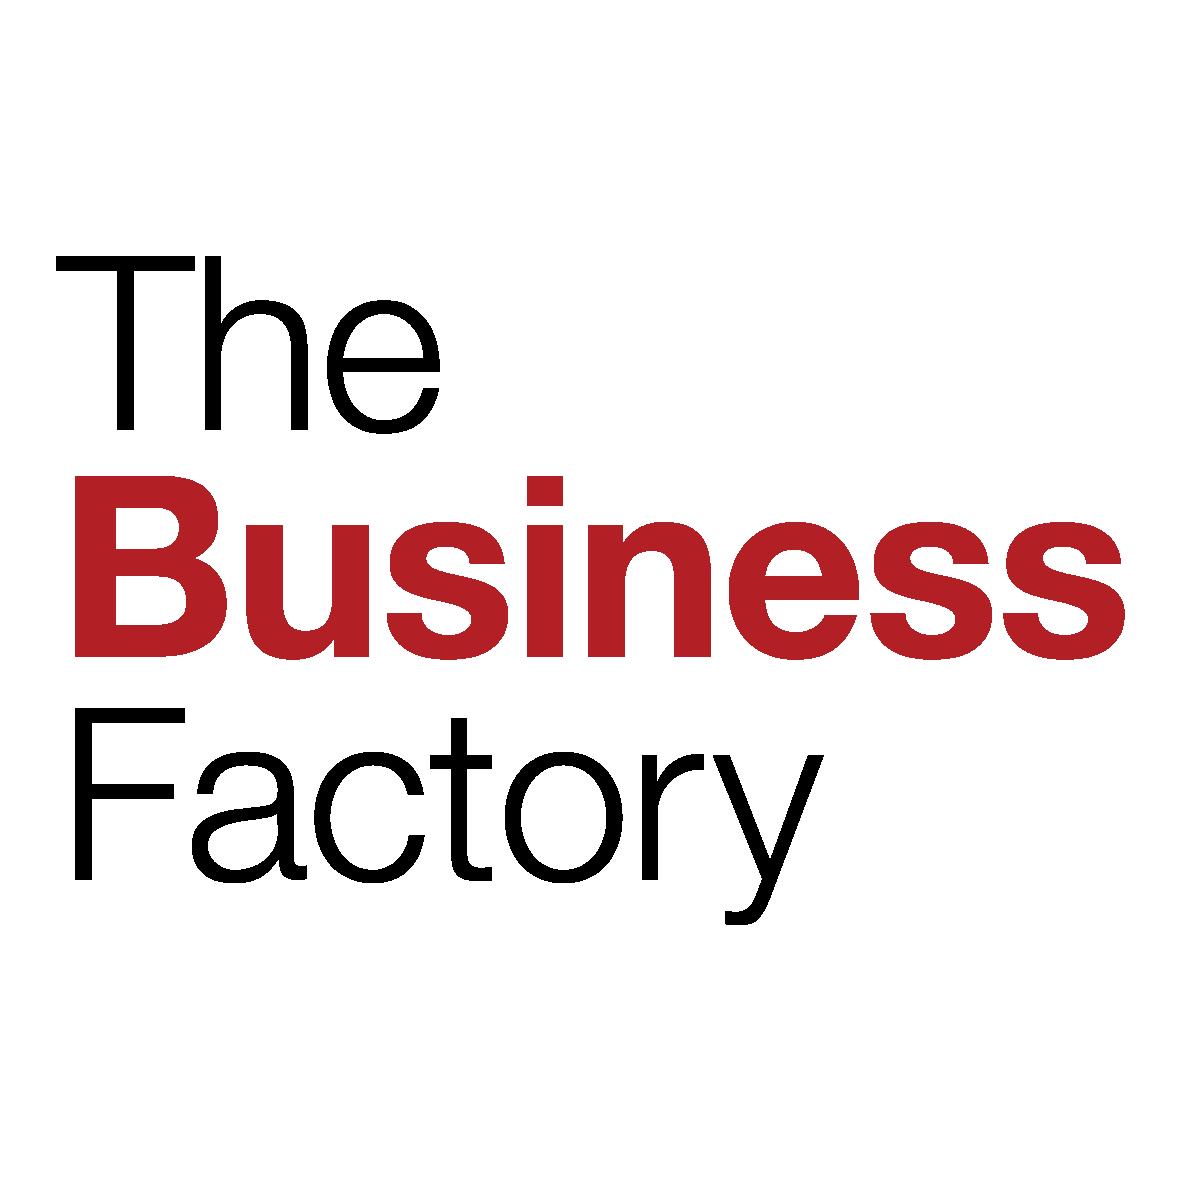 Business Factory Logo